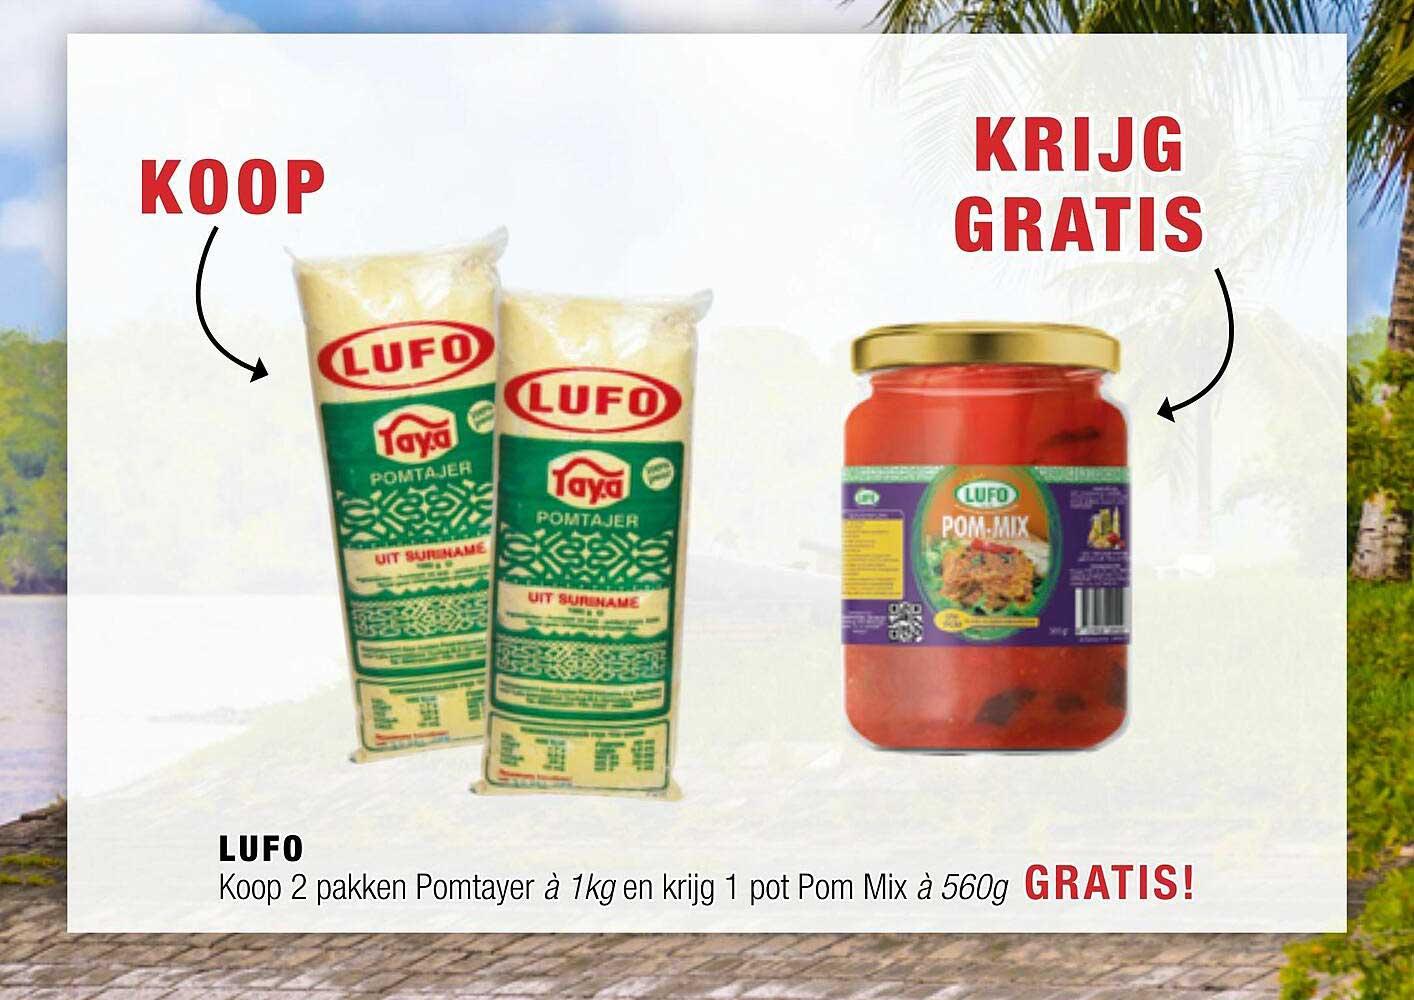 Amazing Oriental Lufo Koop 2 Pakken Pomtayer à 1 Kg En Krijg 1 Pot Pom Mix à 560g Gratis!